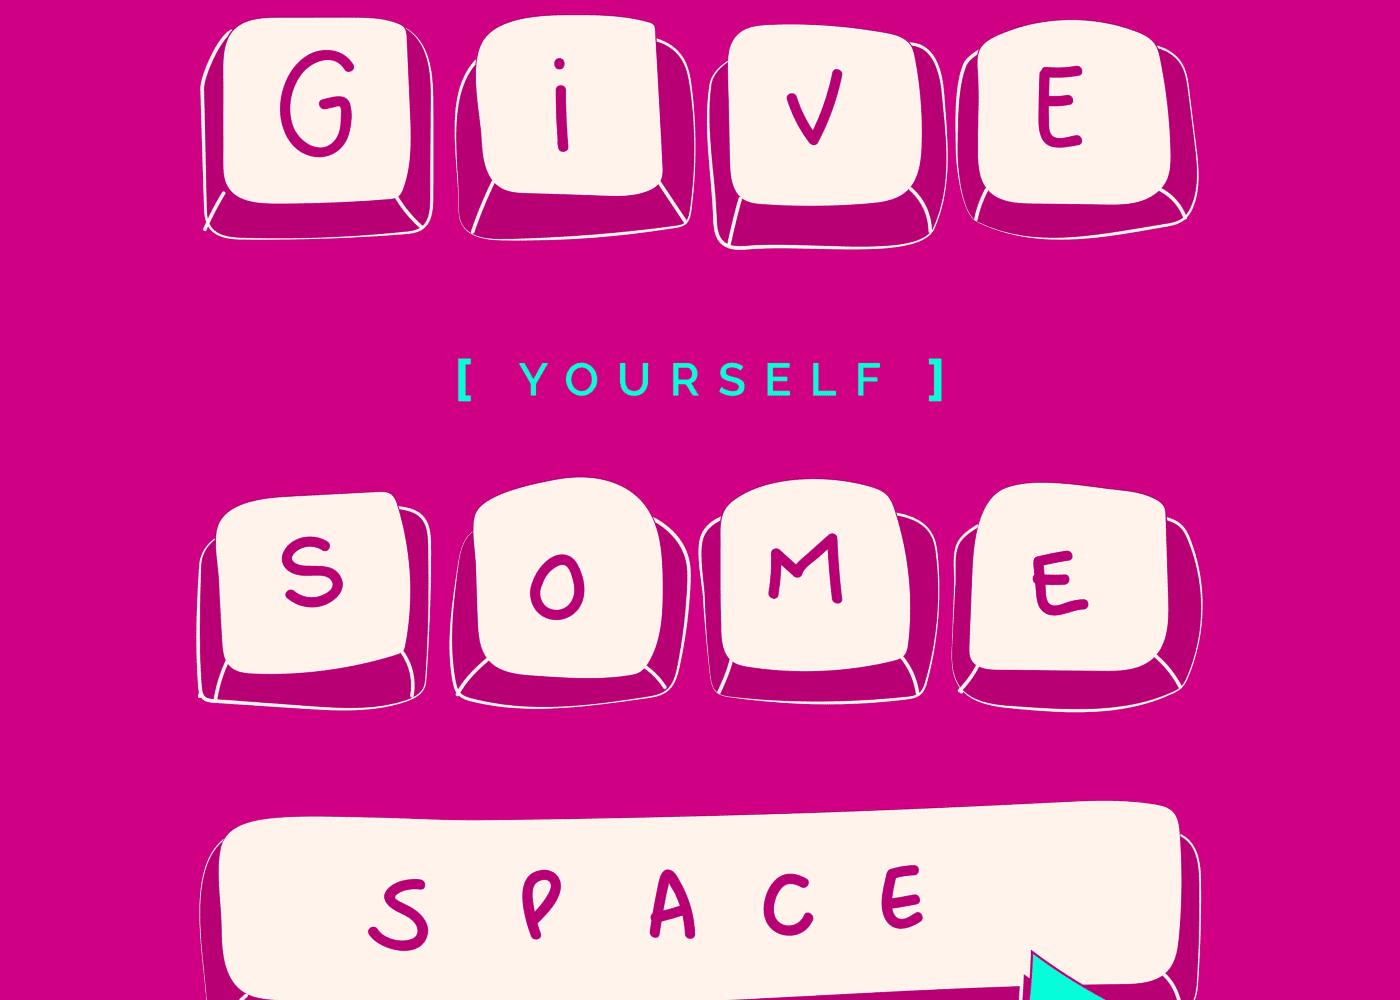 Give Yourself Some Space | Image: Carolina Iplinsky